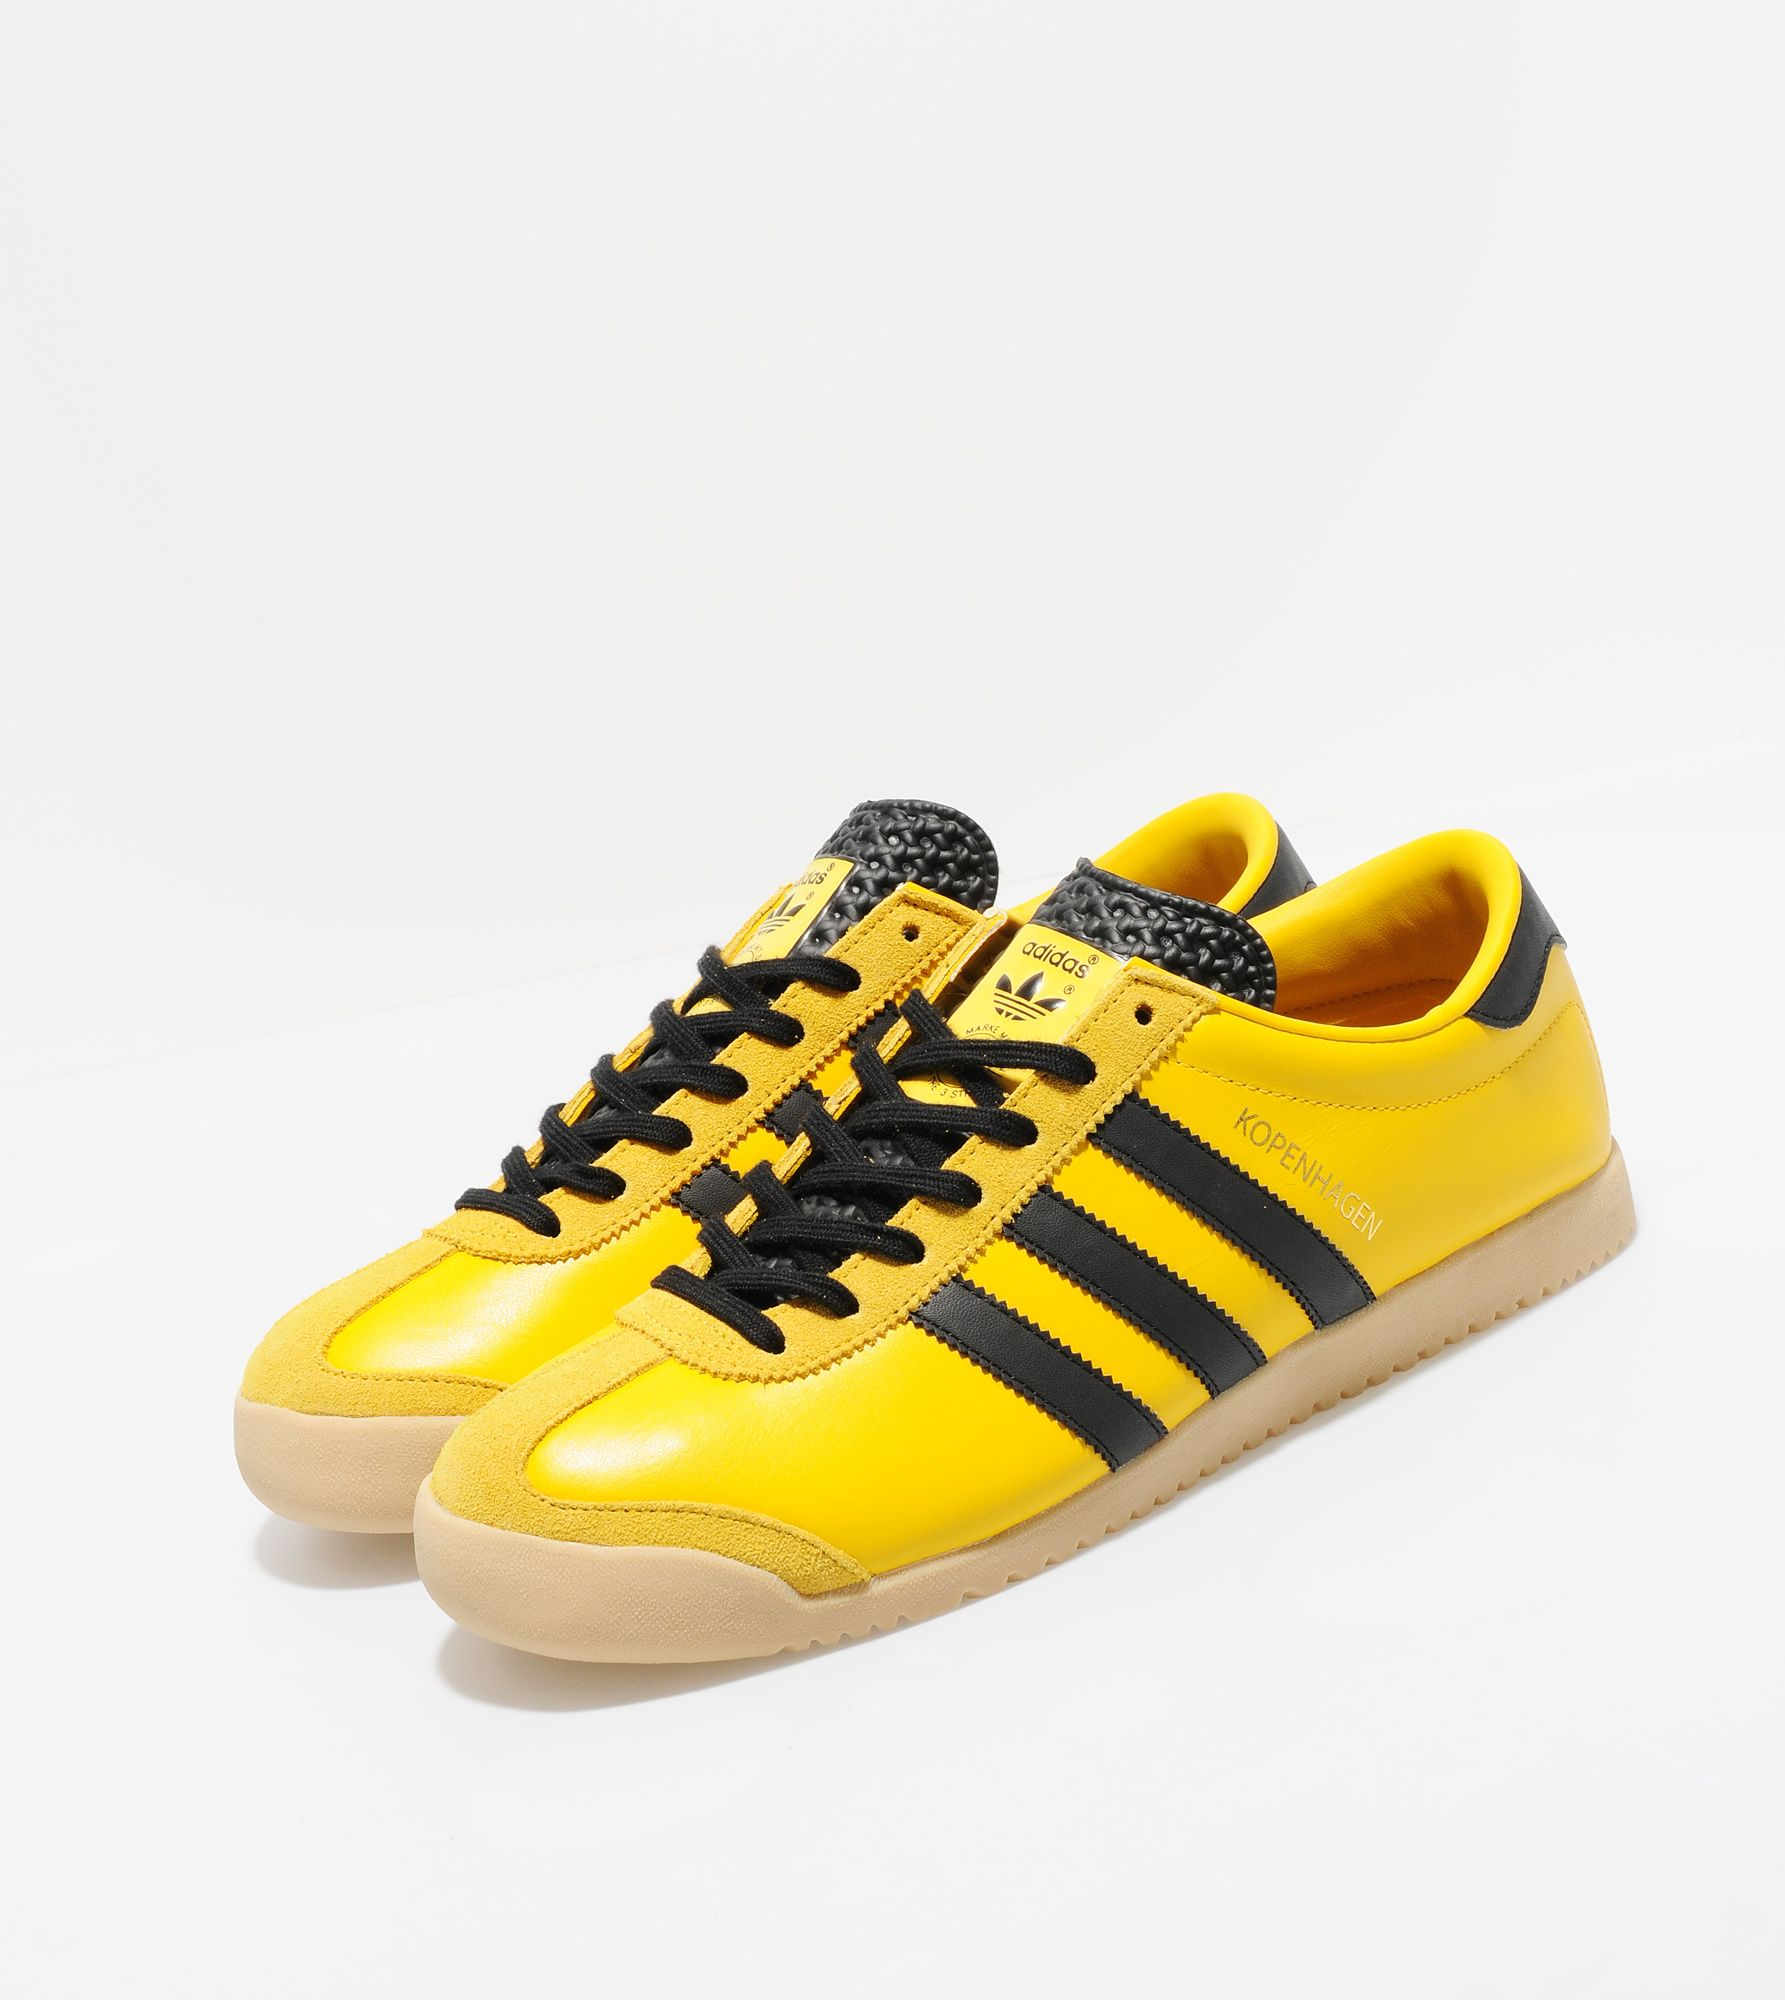 best service eab01 6d6fc Adidas Originals Kopenhagen - size  Exclusive   Size